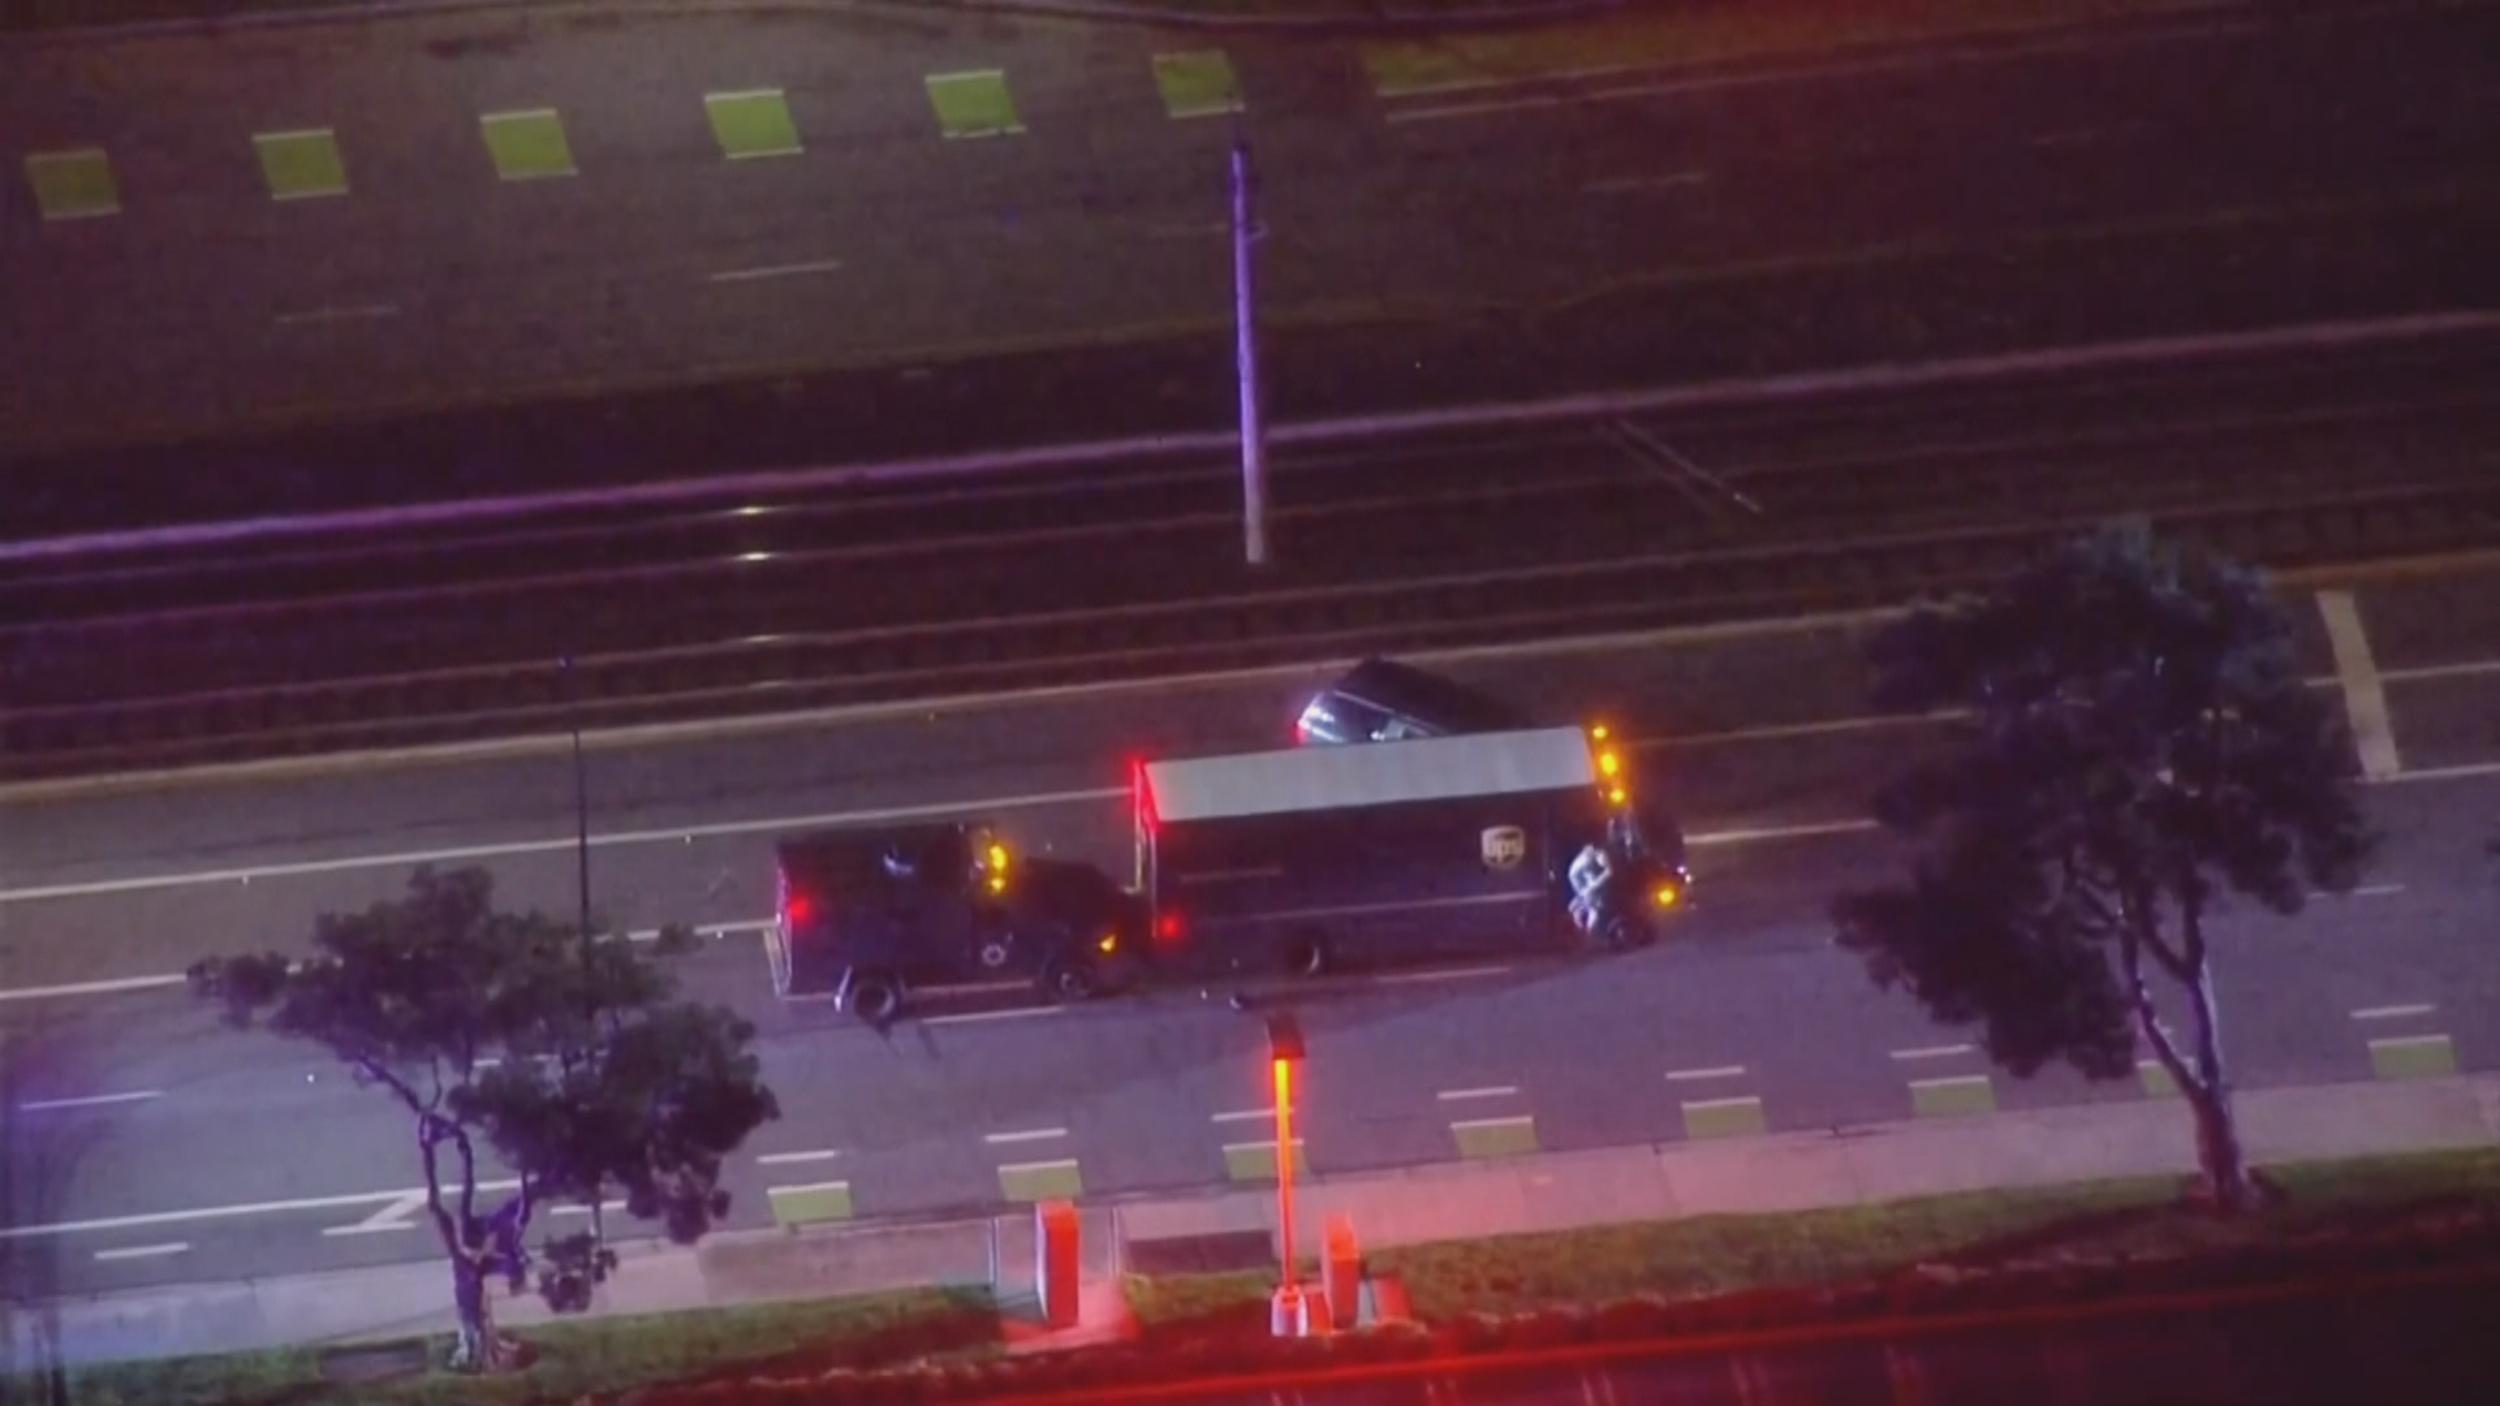 San Jose police fatally shoot UPS truck hijacker after hours-long